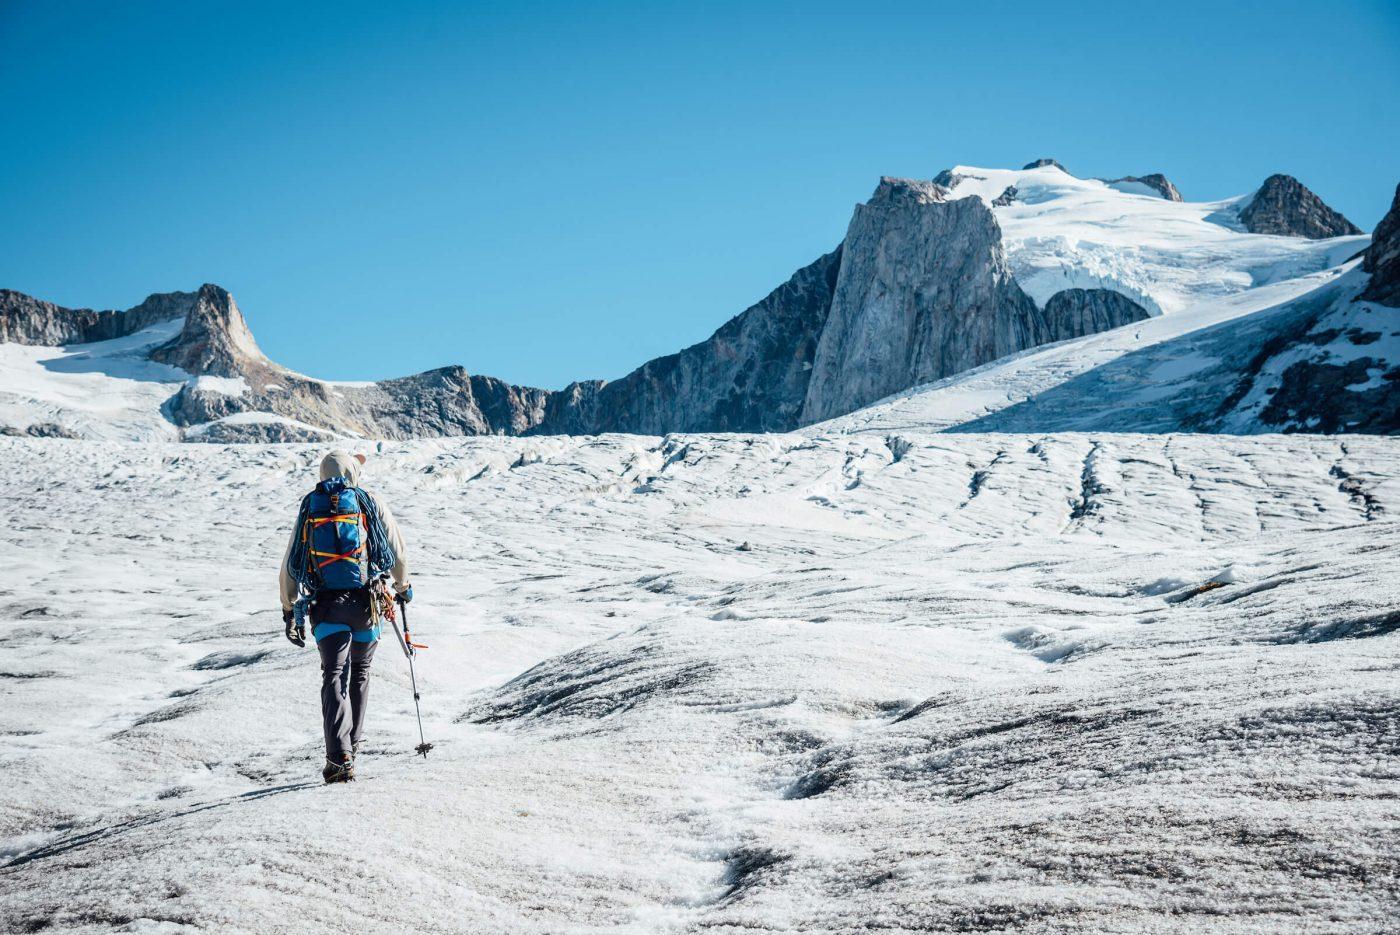 Climber on a glacier walking, East Of Tasiilaq Fjord. By Chris Brinlee Jr